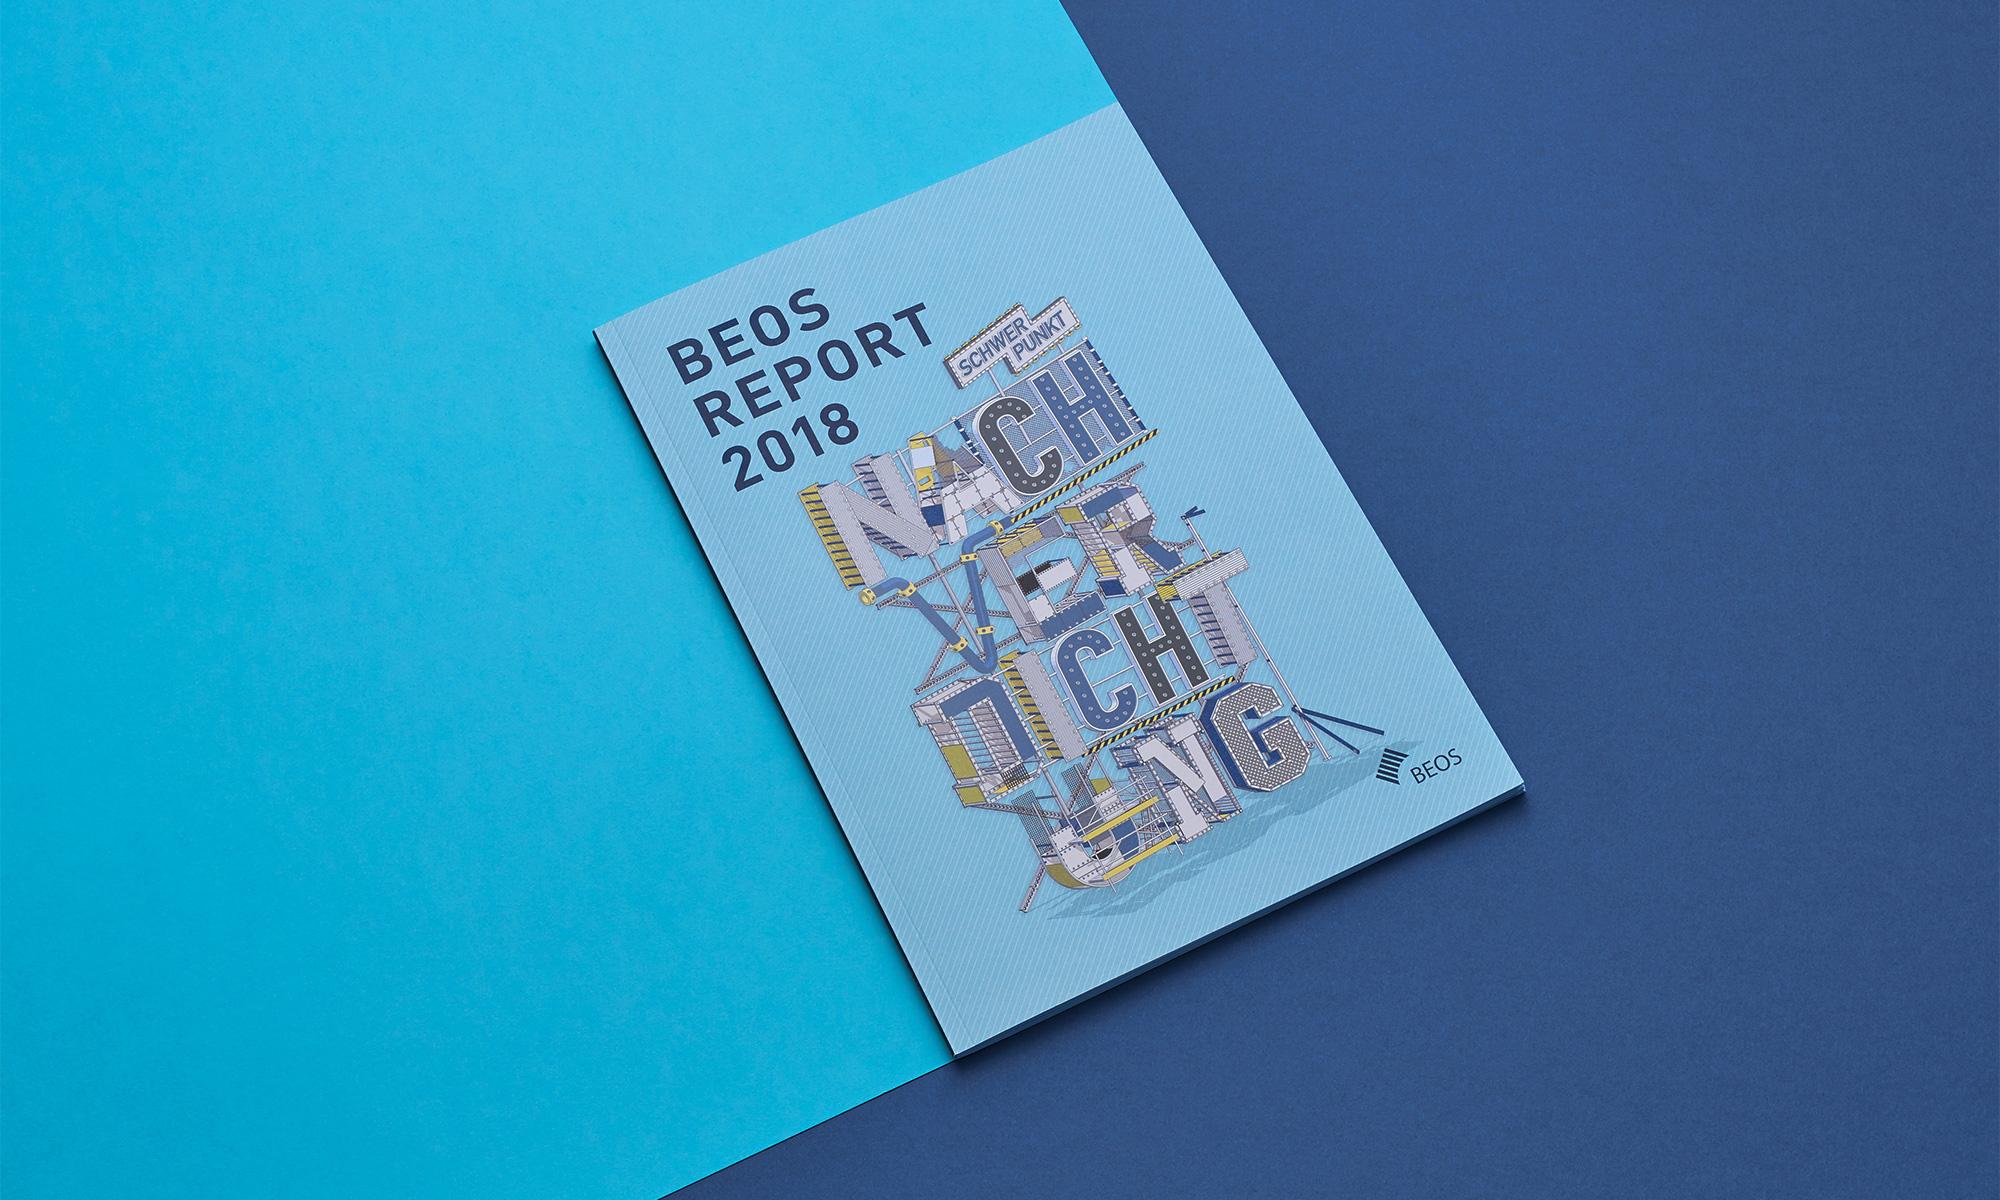 Beos Report 2018